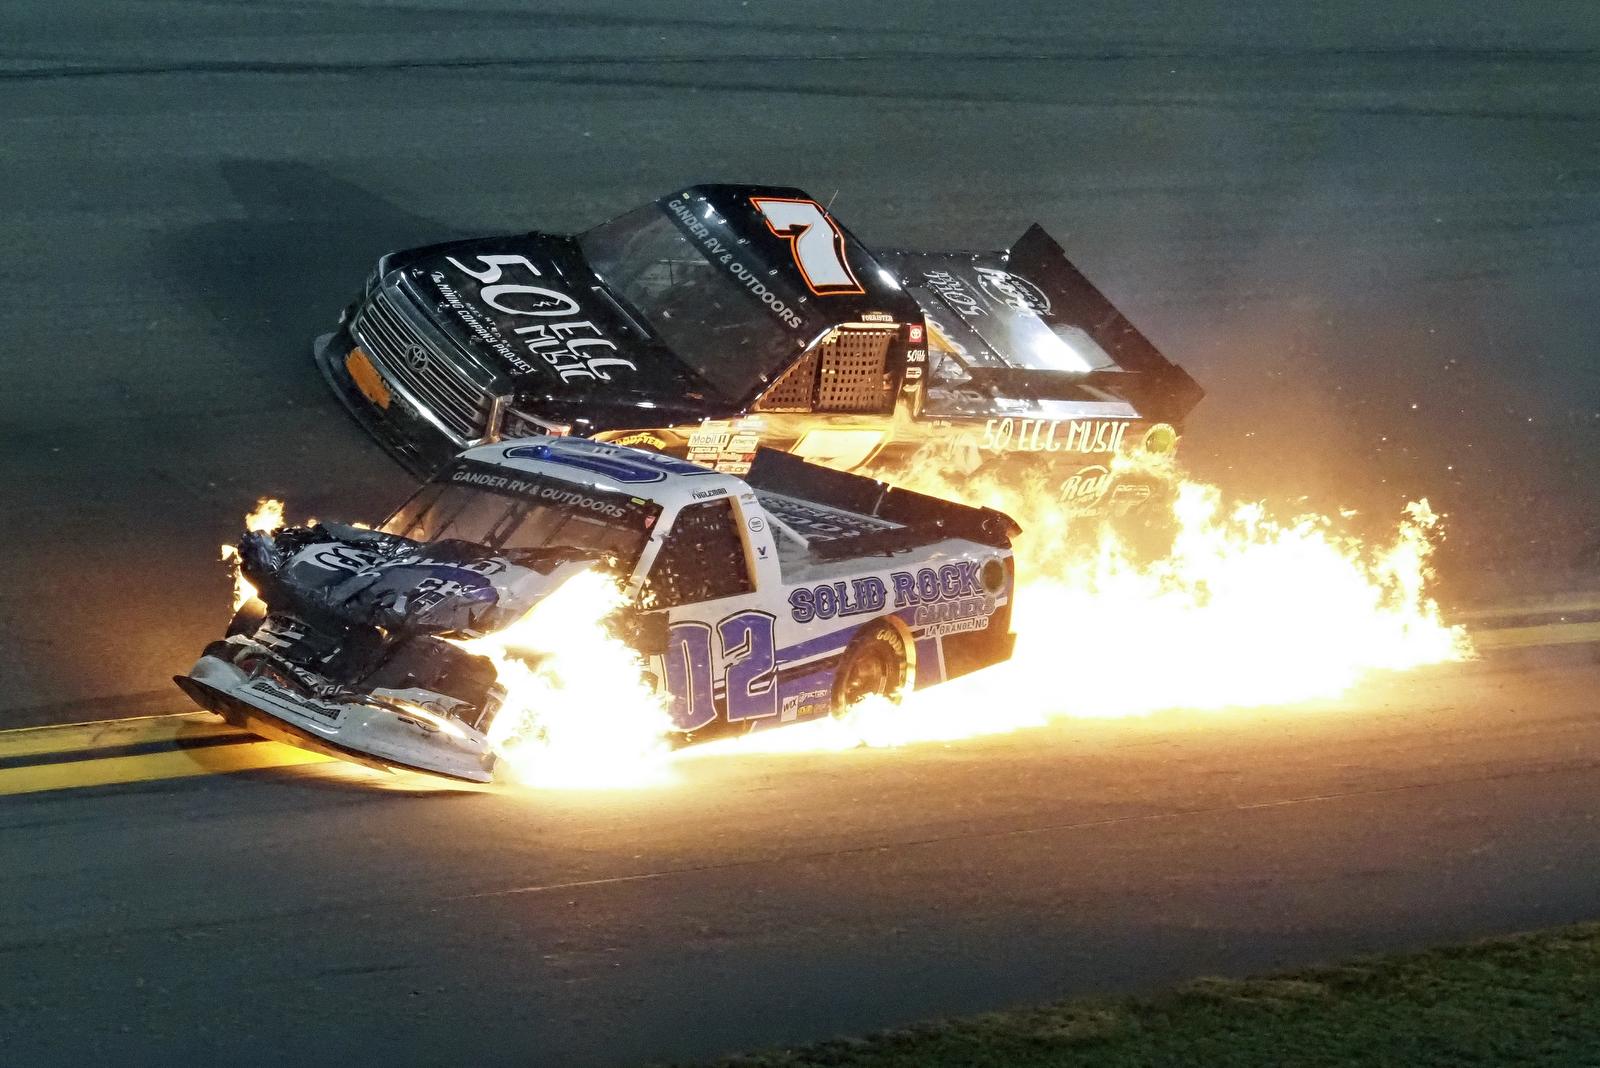 Tate Fogleman (02) and Korbin Forrister (7) crash between turns 3 and 4 during the NASCAR Truck Series auto race at Daytona International Speedway, Friday, Feb. 14, 2020, in Daytona Beach, Fla. AP